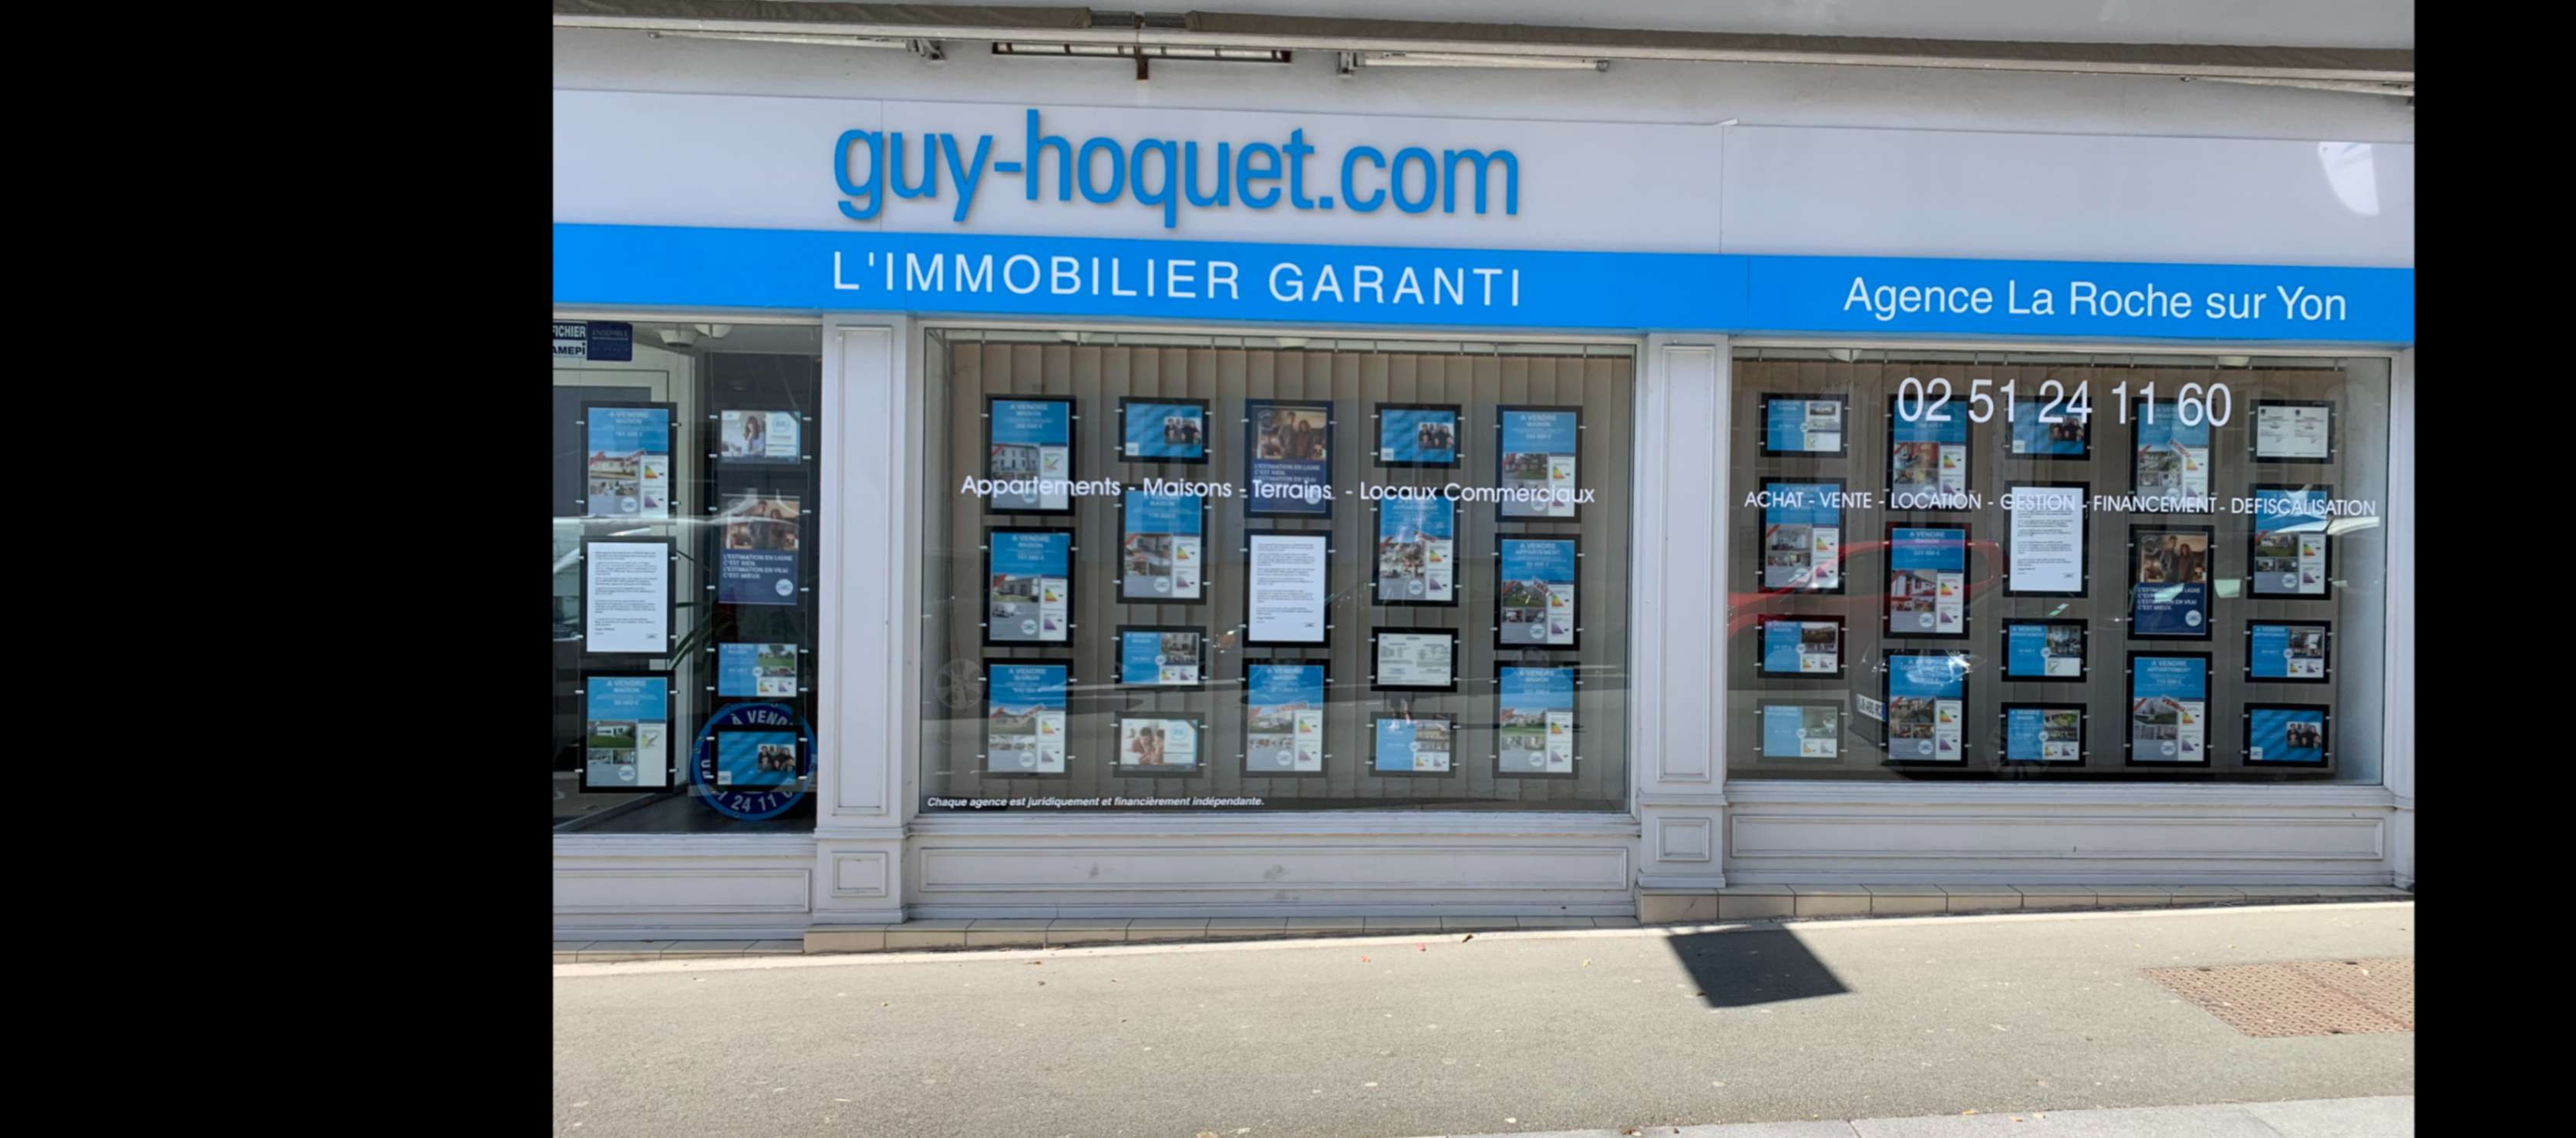 Agence Guy Hoquet LA ROCHE SUR YON